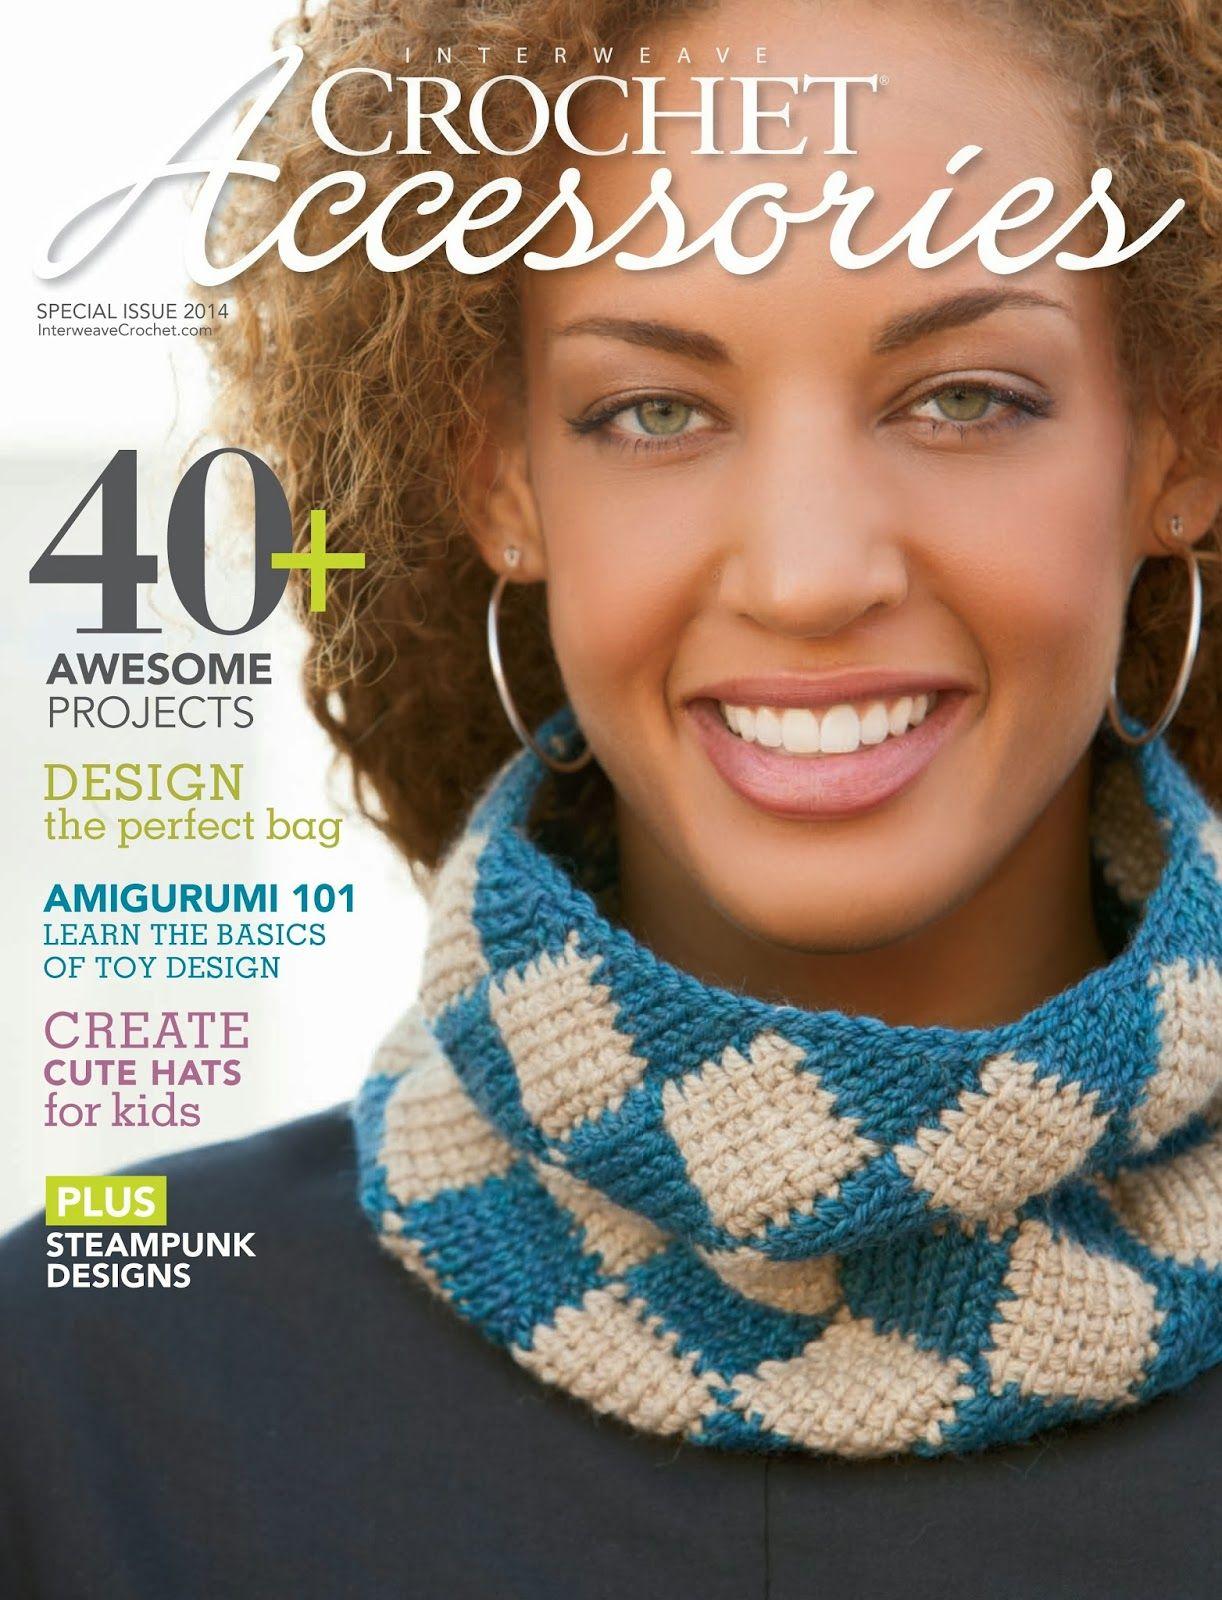 Revista Crochet Accesorios 2014 - Patrones Crochet   crochet ...